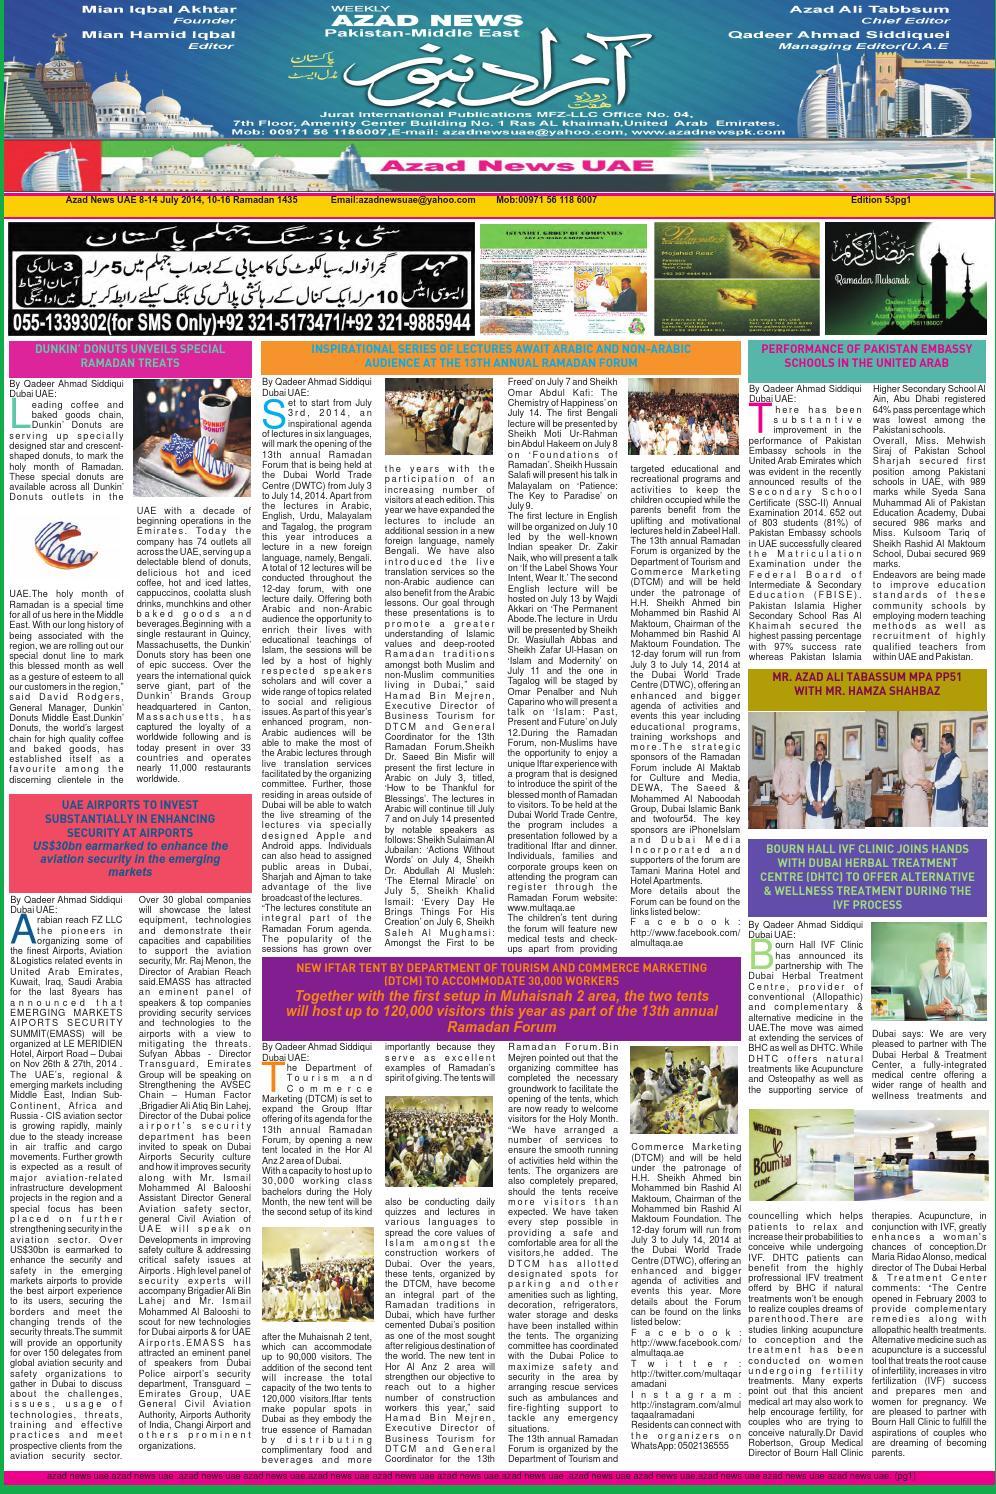 Azad news edition 53 by Qadeer Ahmad Siddiqui - issuu